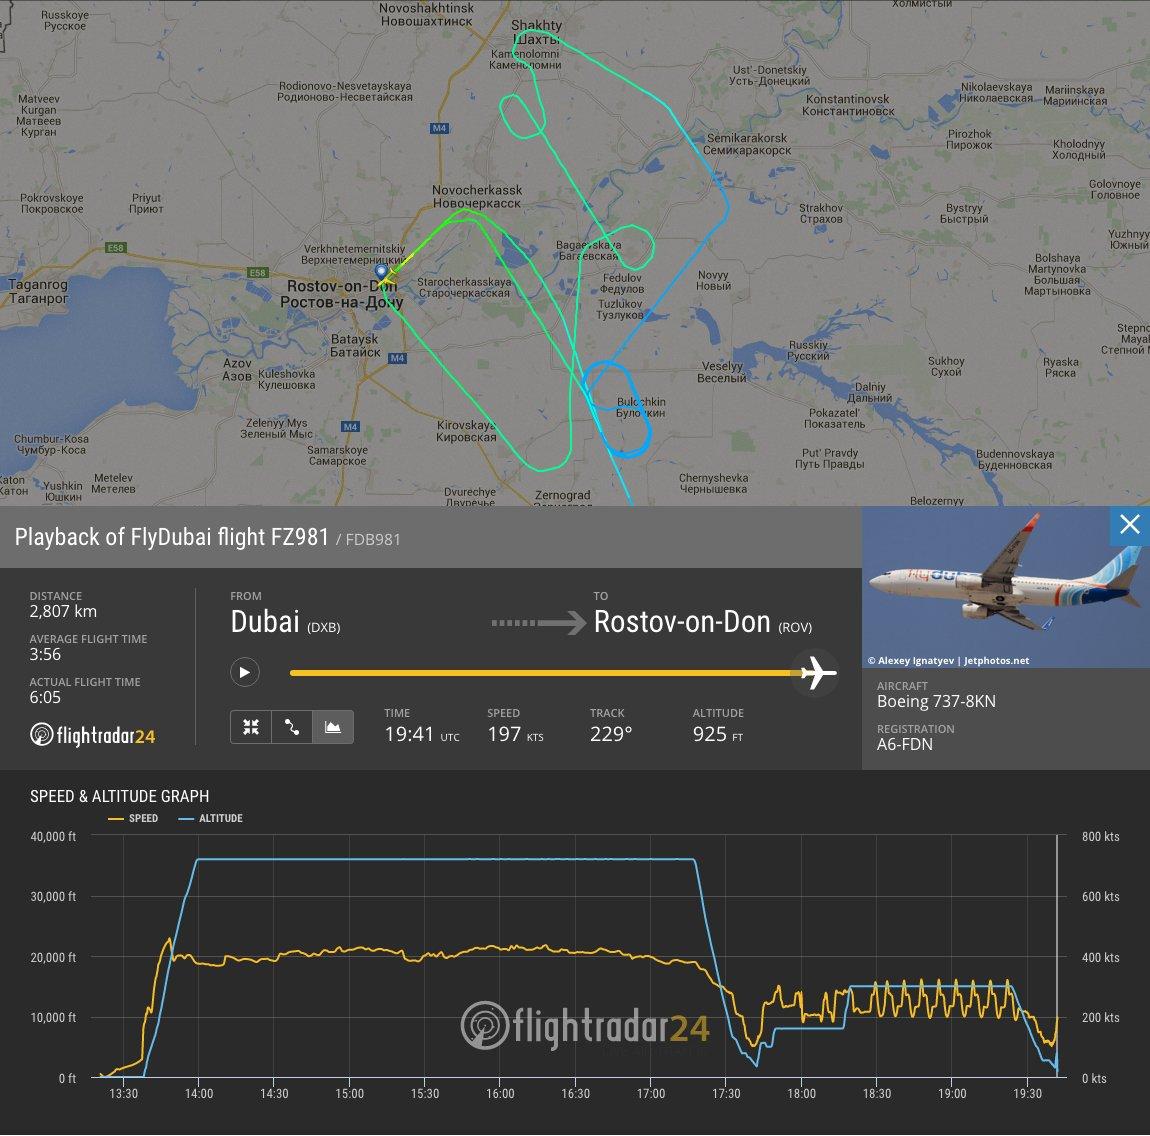 Flight path of FZ981